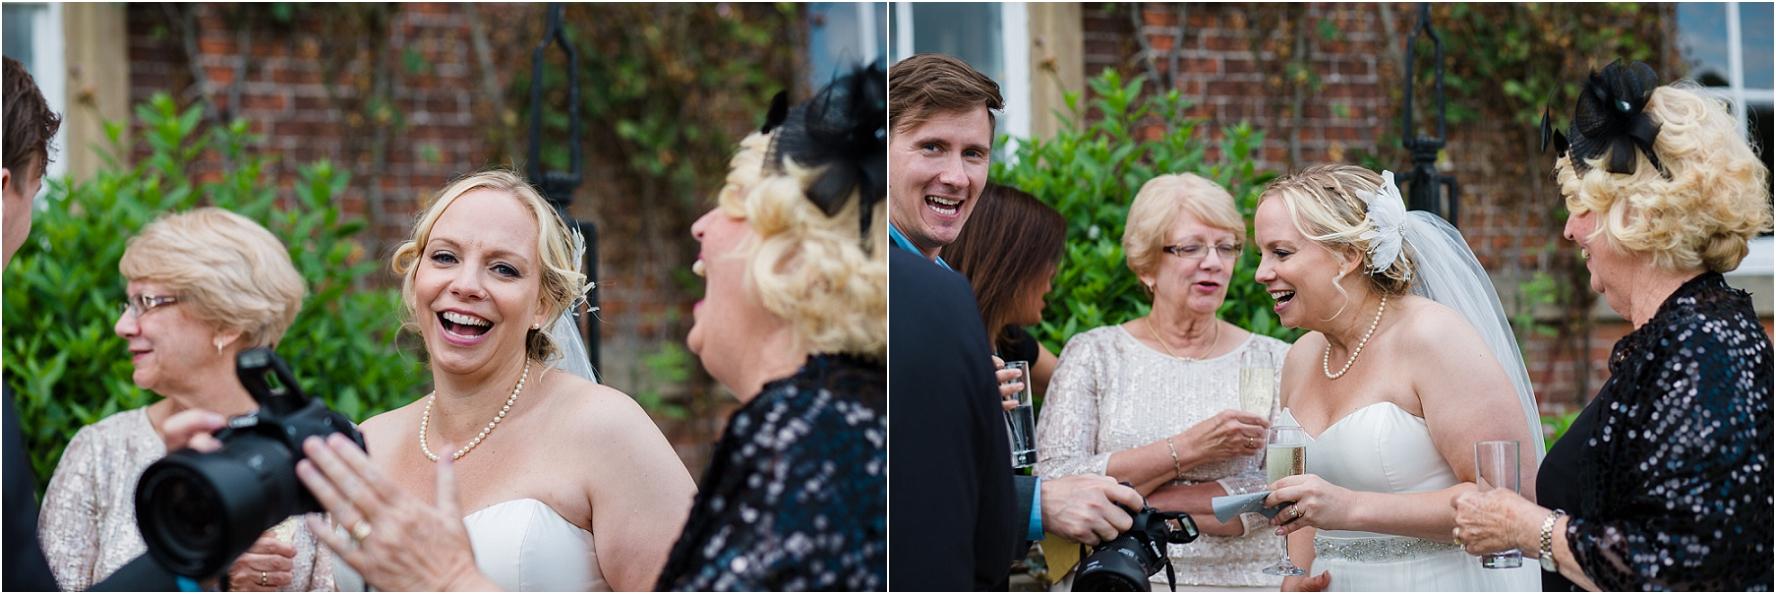 wedding-photography-the-orangery-settringham_0472